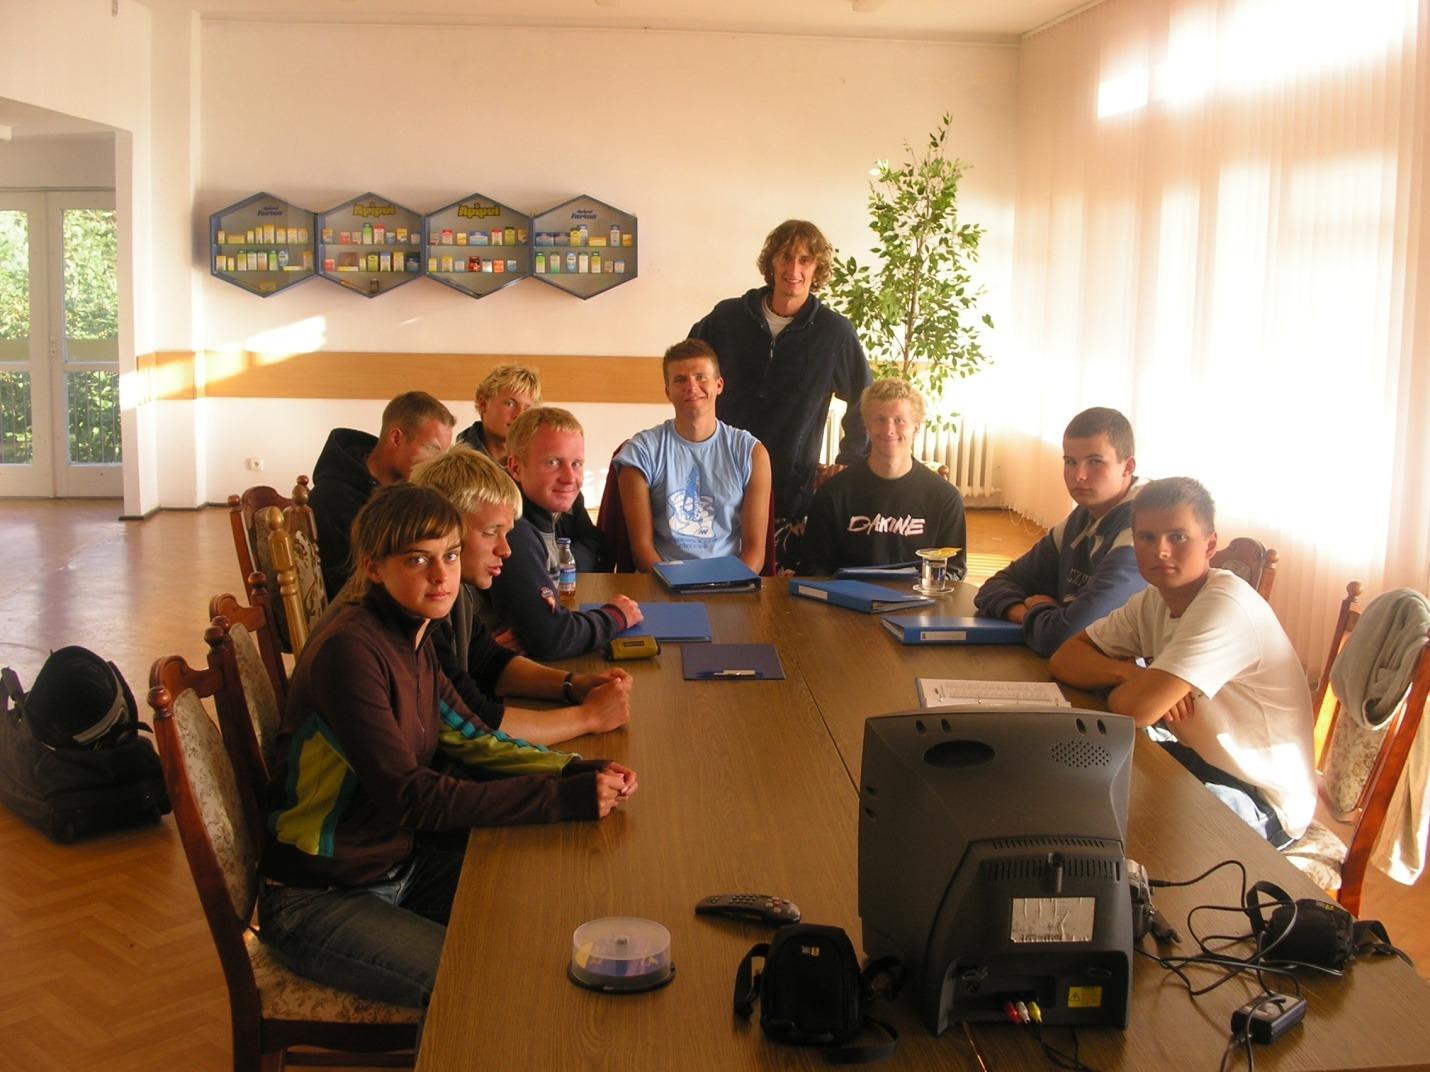 Jurata - kurs instruktorski VDWS - zdjęcia